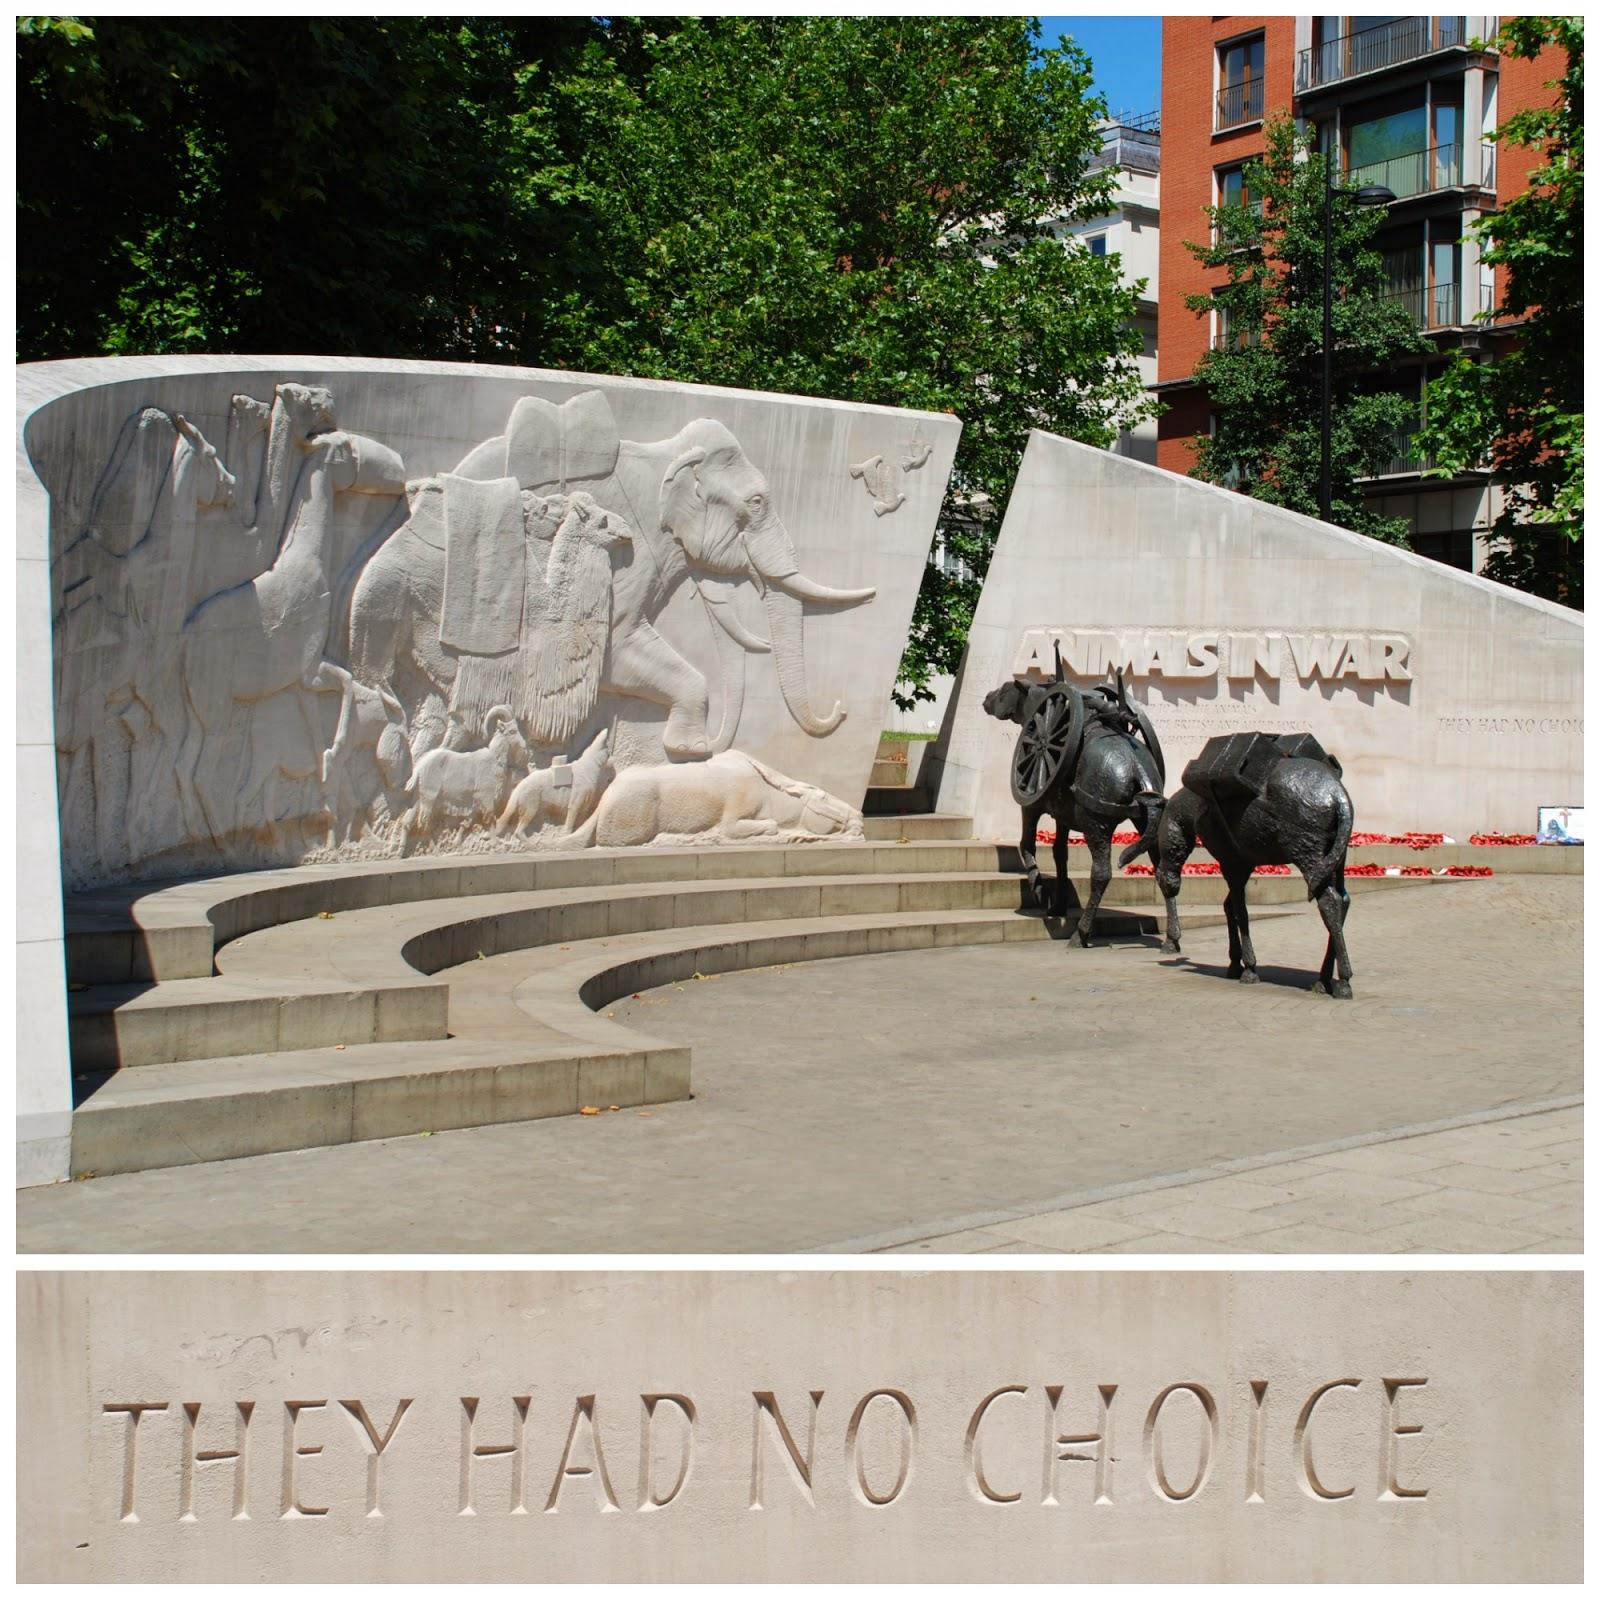 Animals in War Memorial, Park Lane, London